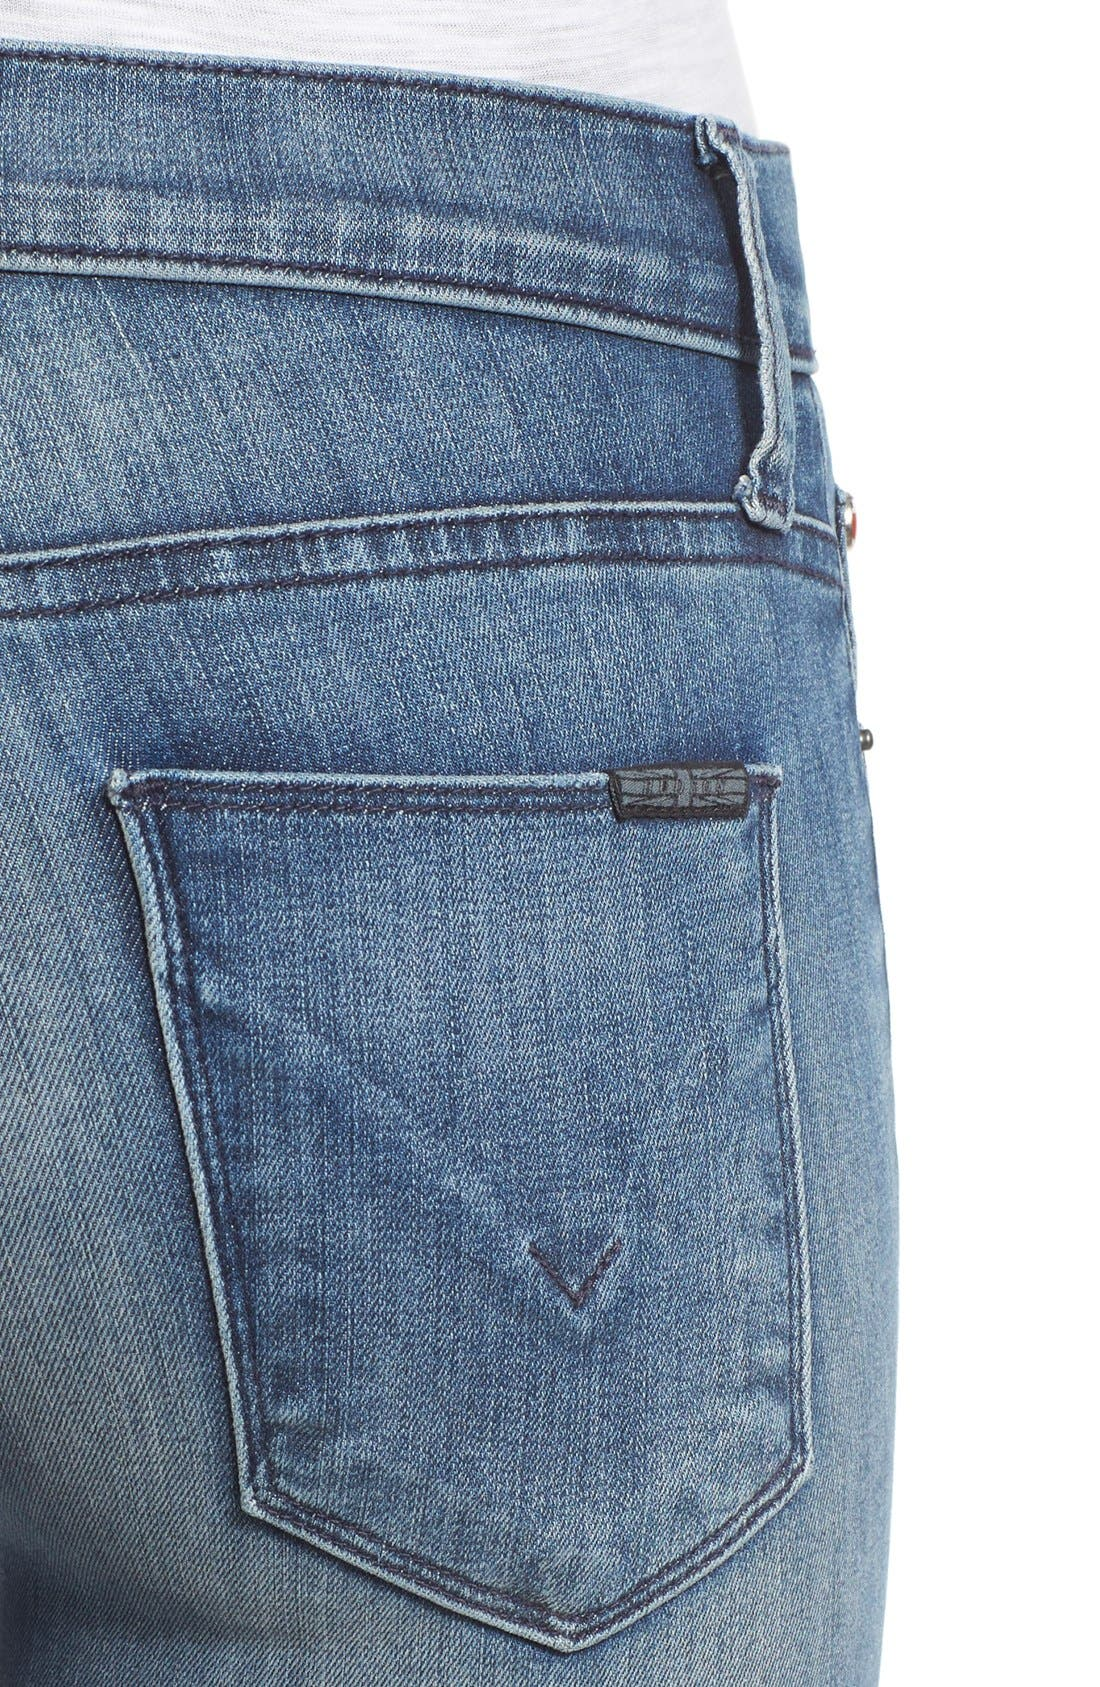 'Nico' Super Skinny Jeans,                             Alternate thumbnail 23, color,